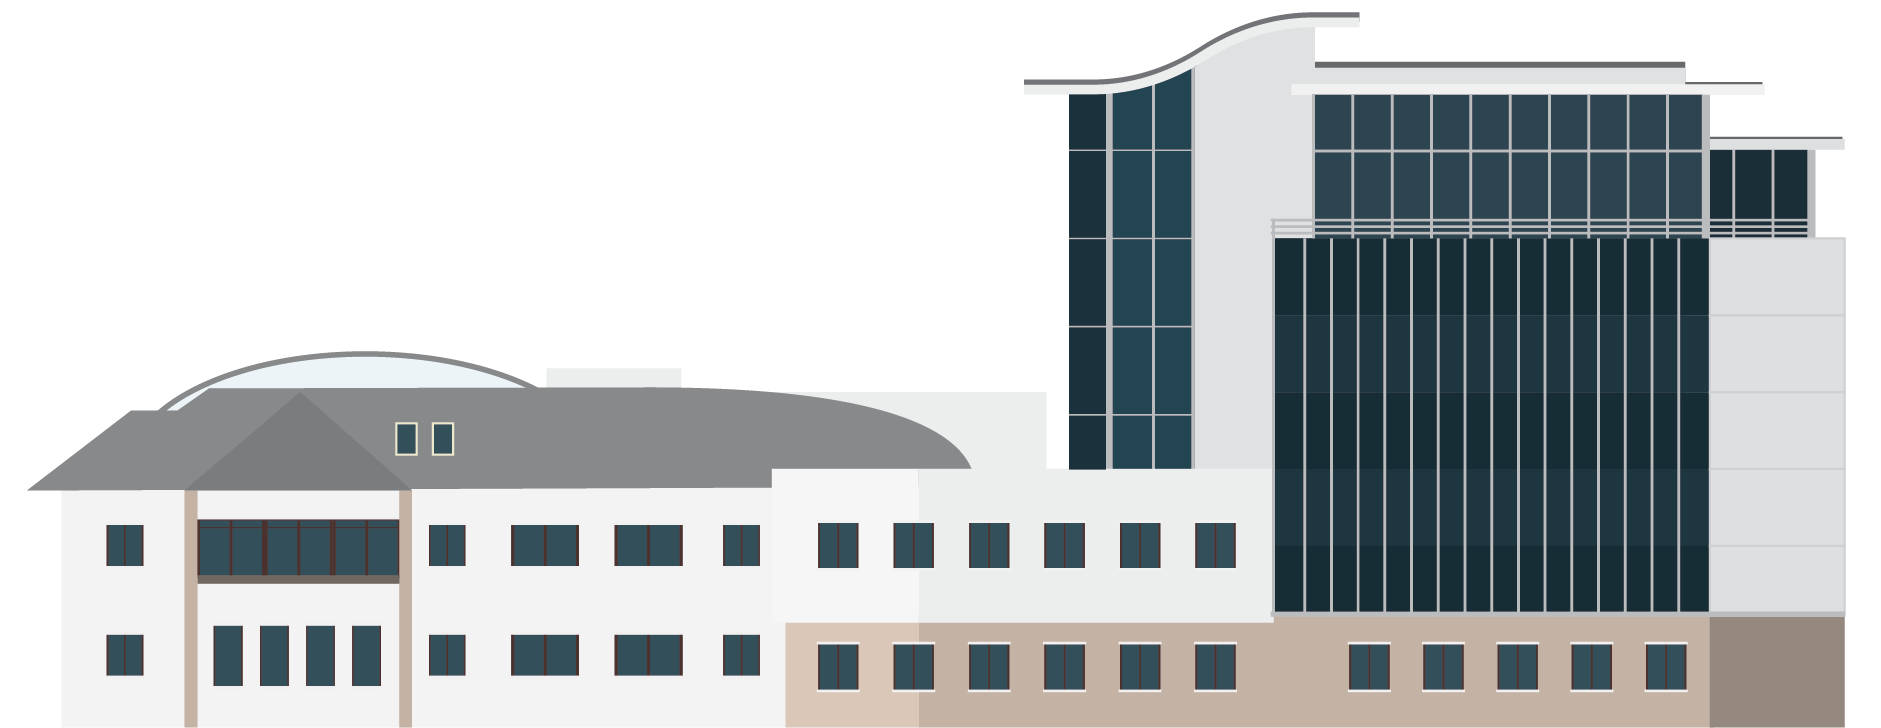 Scymaris lab illustration